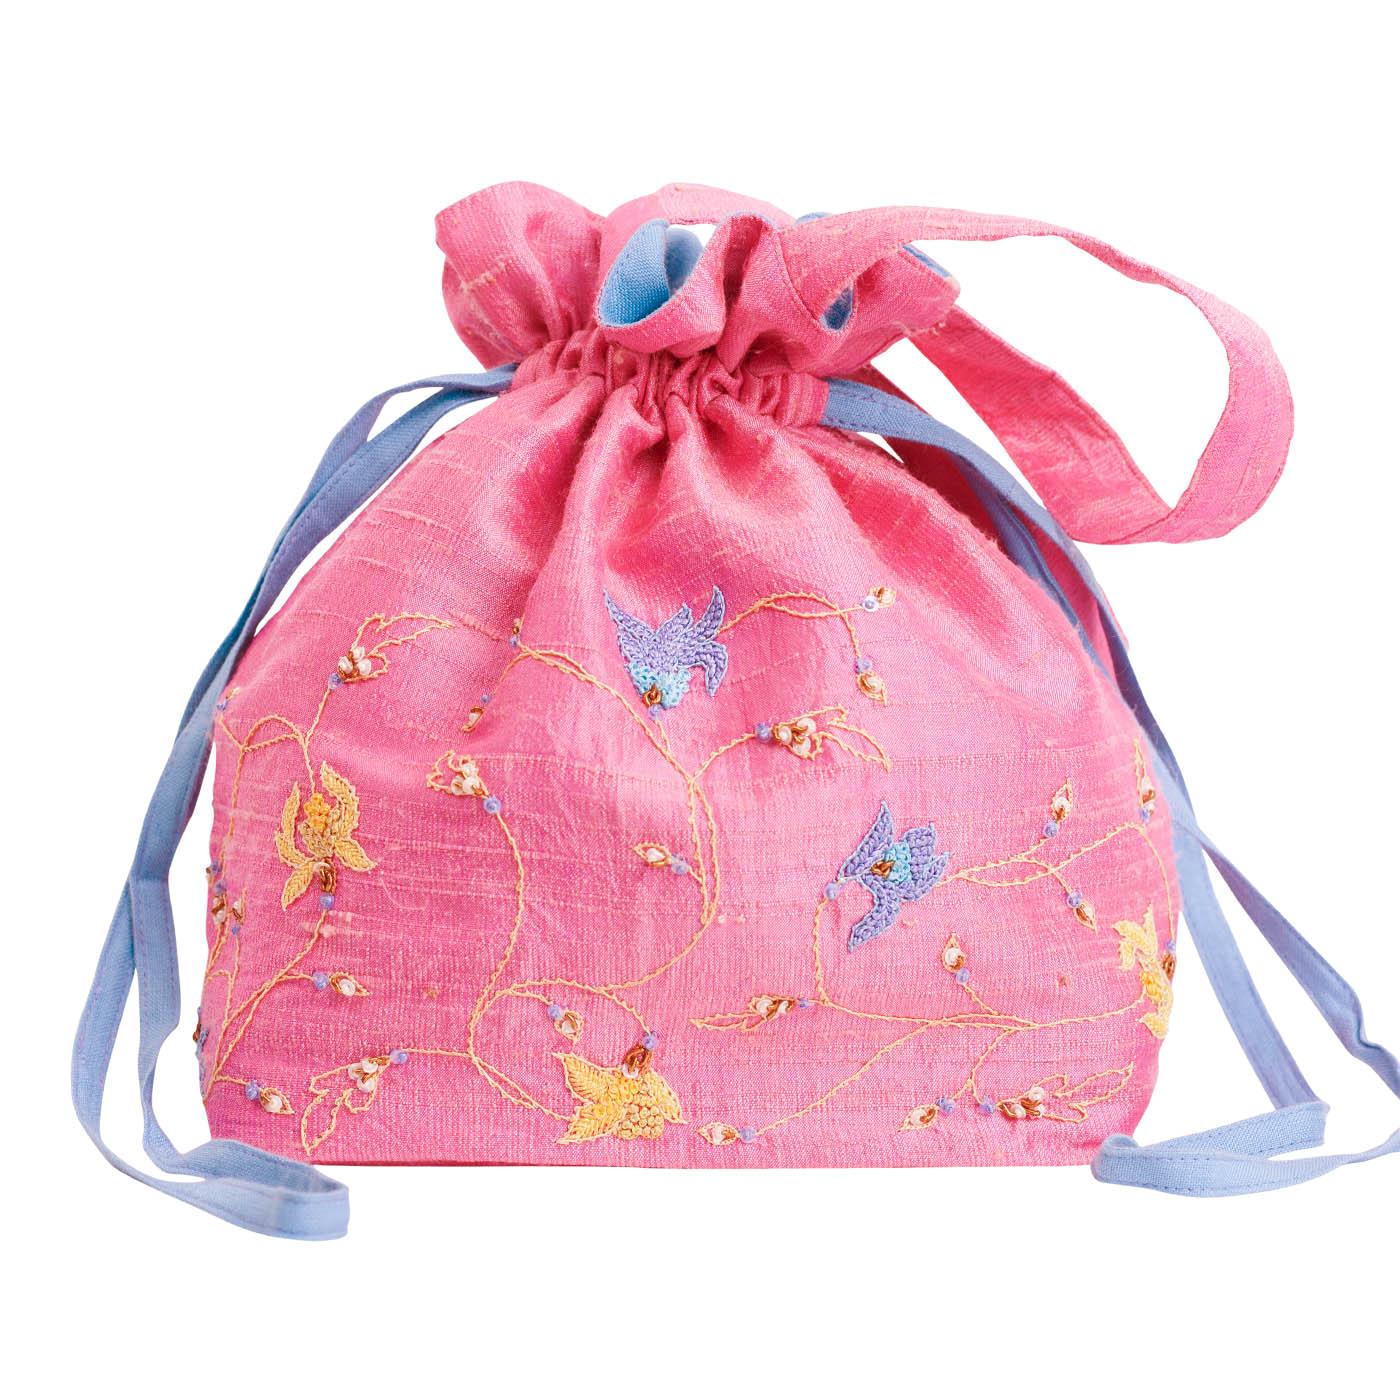 MINC Embroidered Raw Silk Potli Bag in Lotus Pink